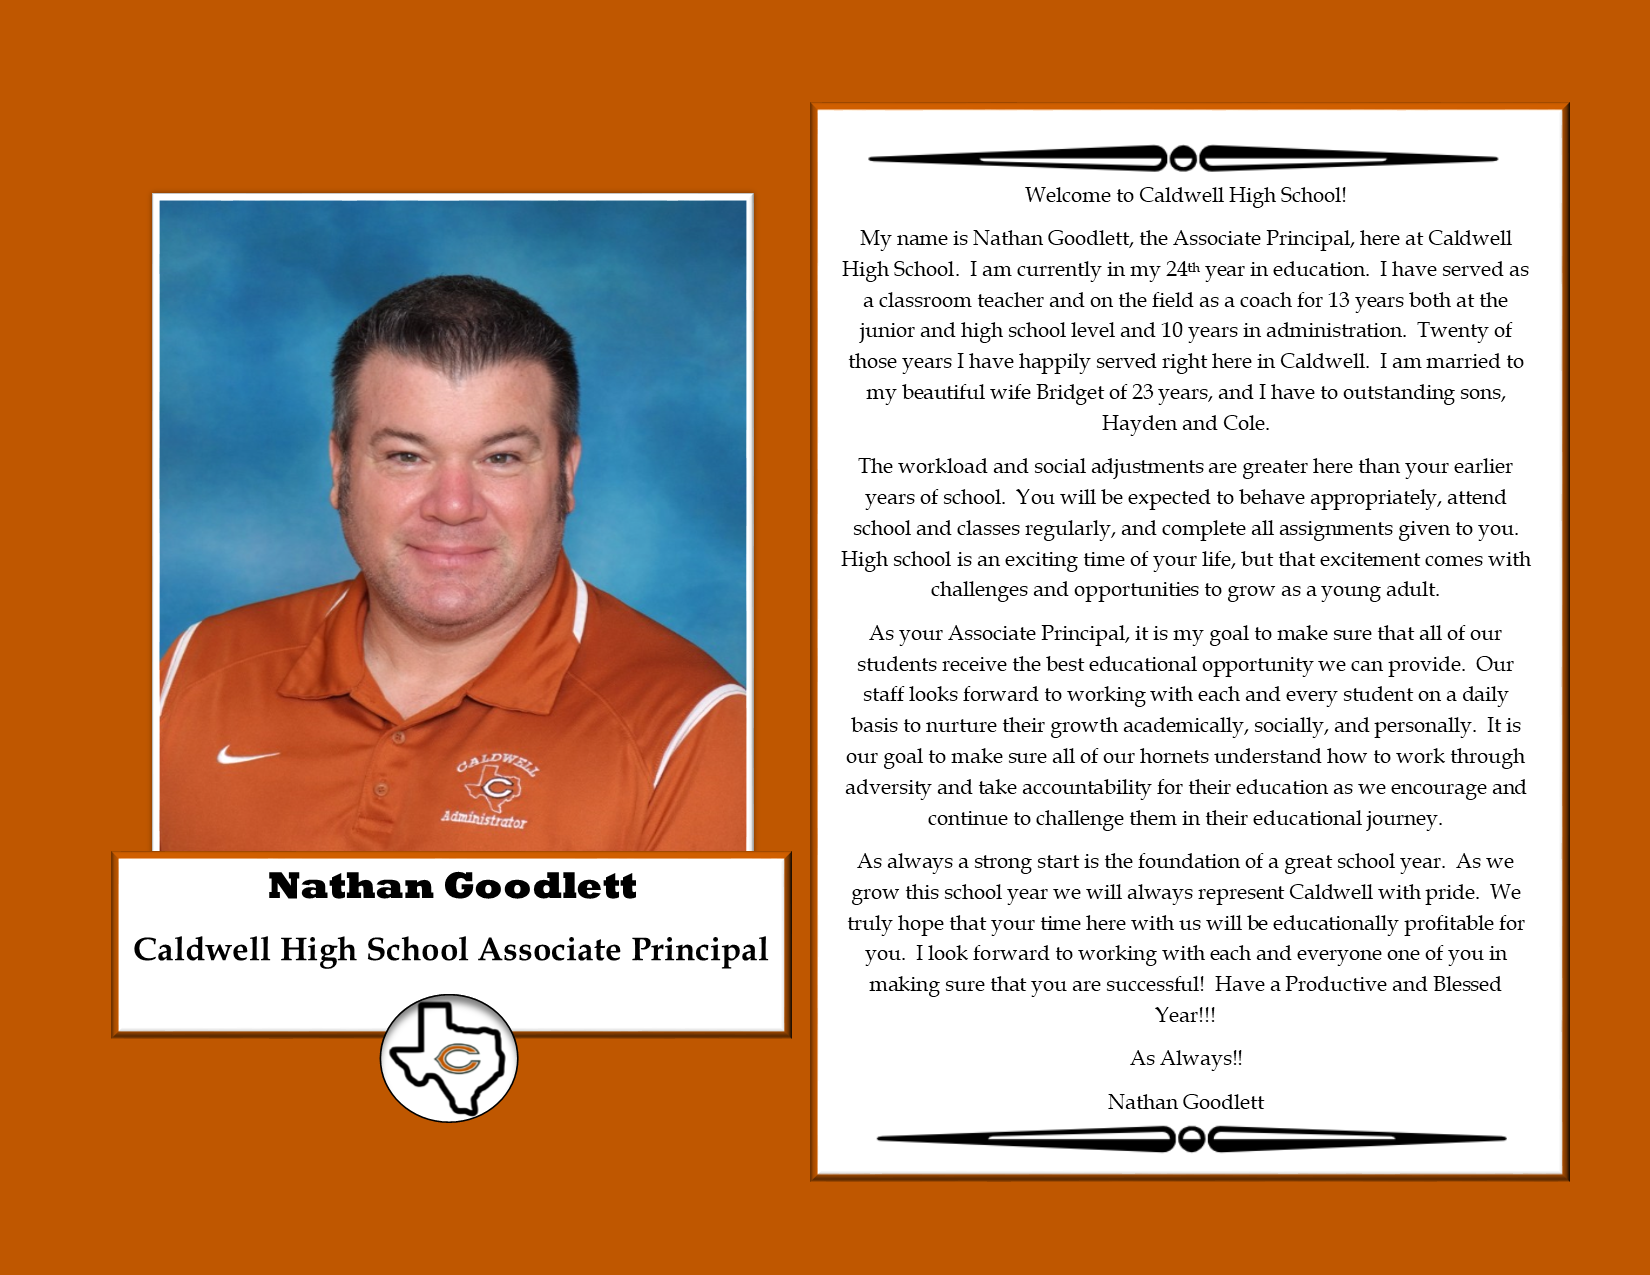 Mr. Goodlett's Message